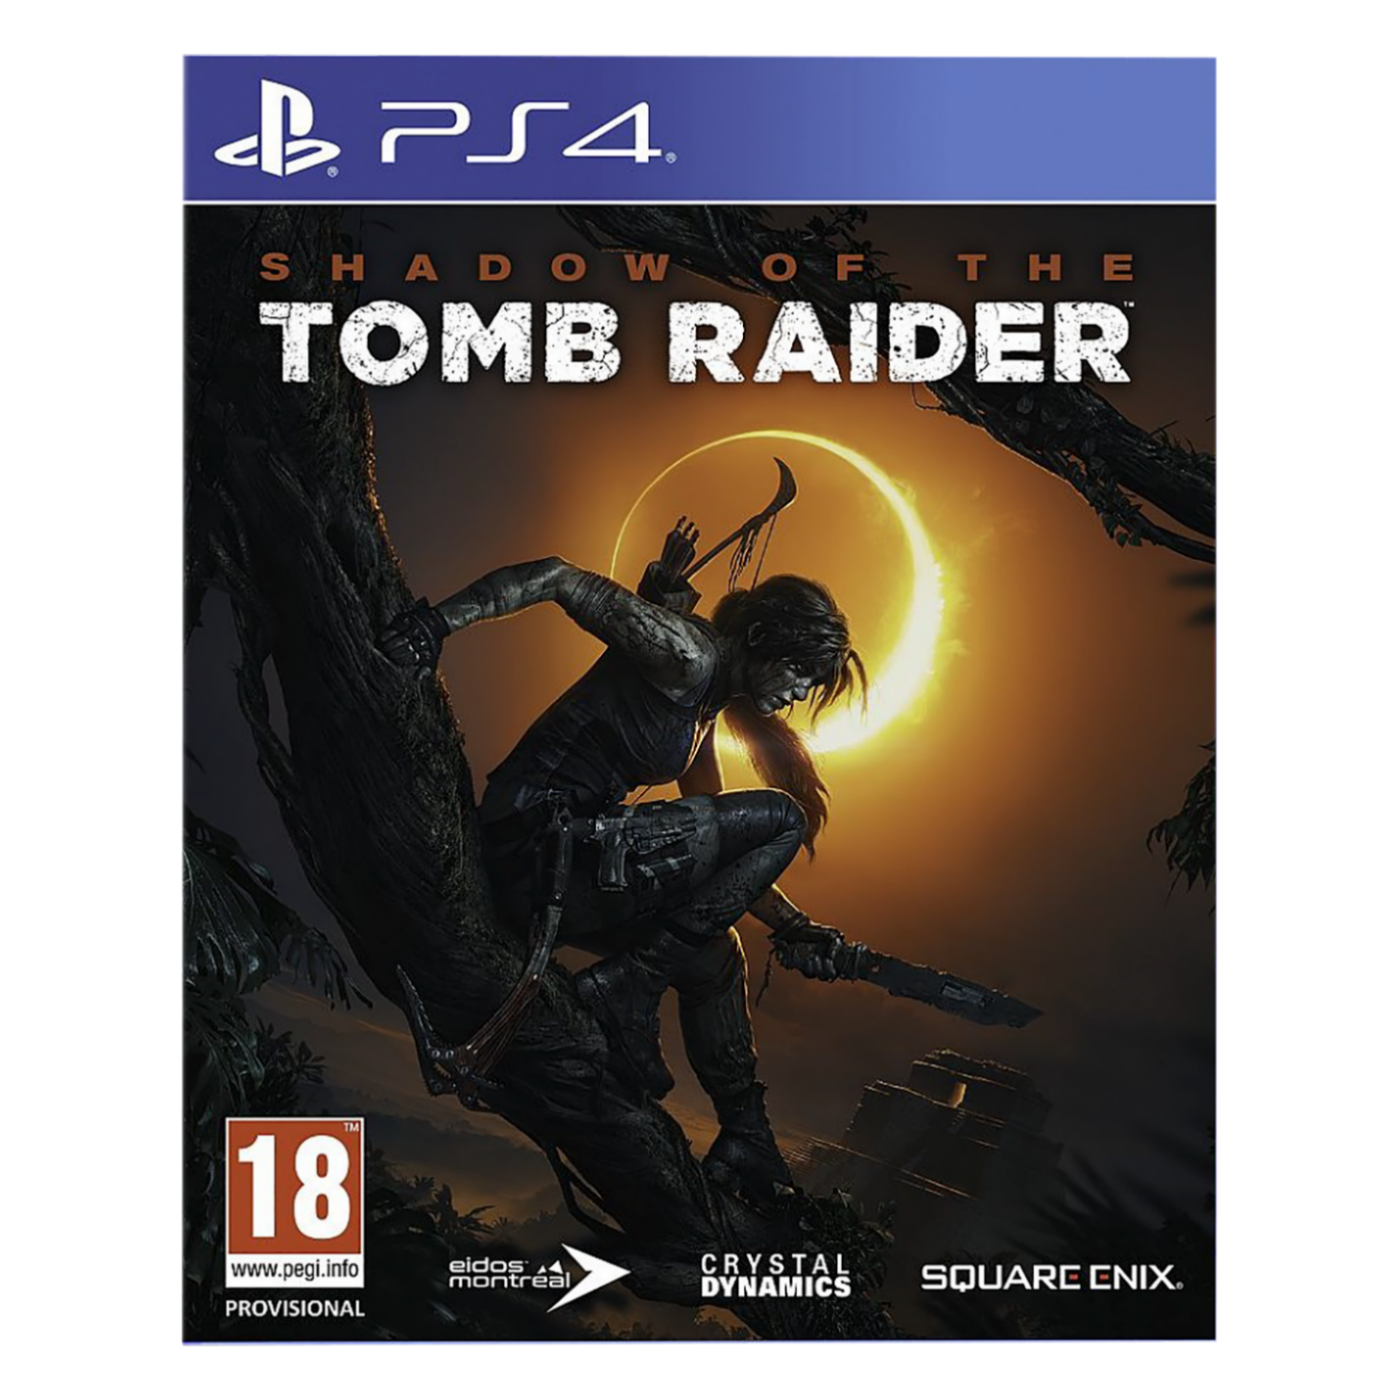 Igra Play Station 4 : SHADOW OF THE TOMB RAIDER, SE